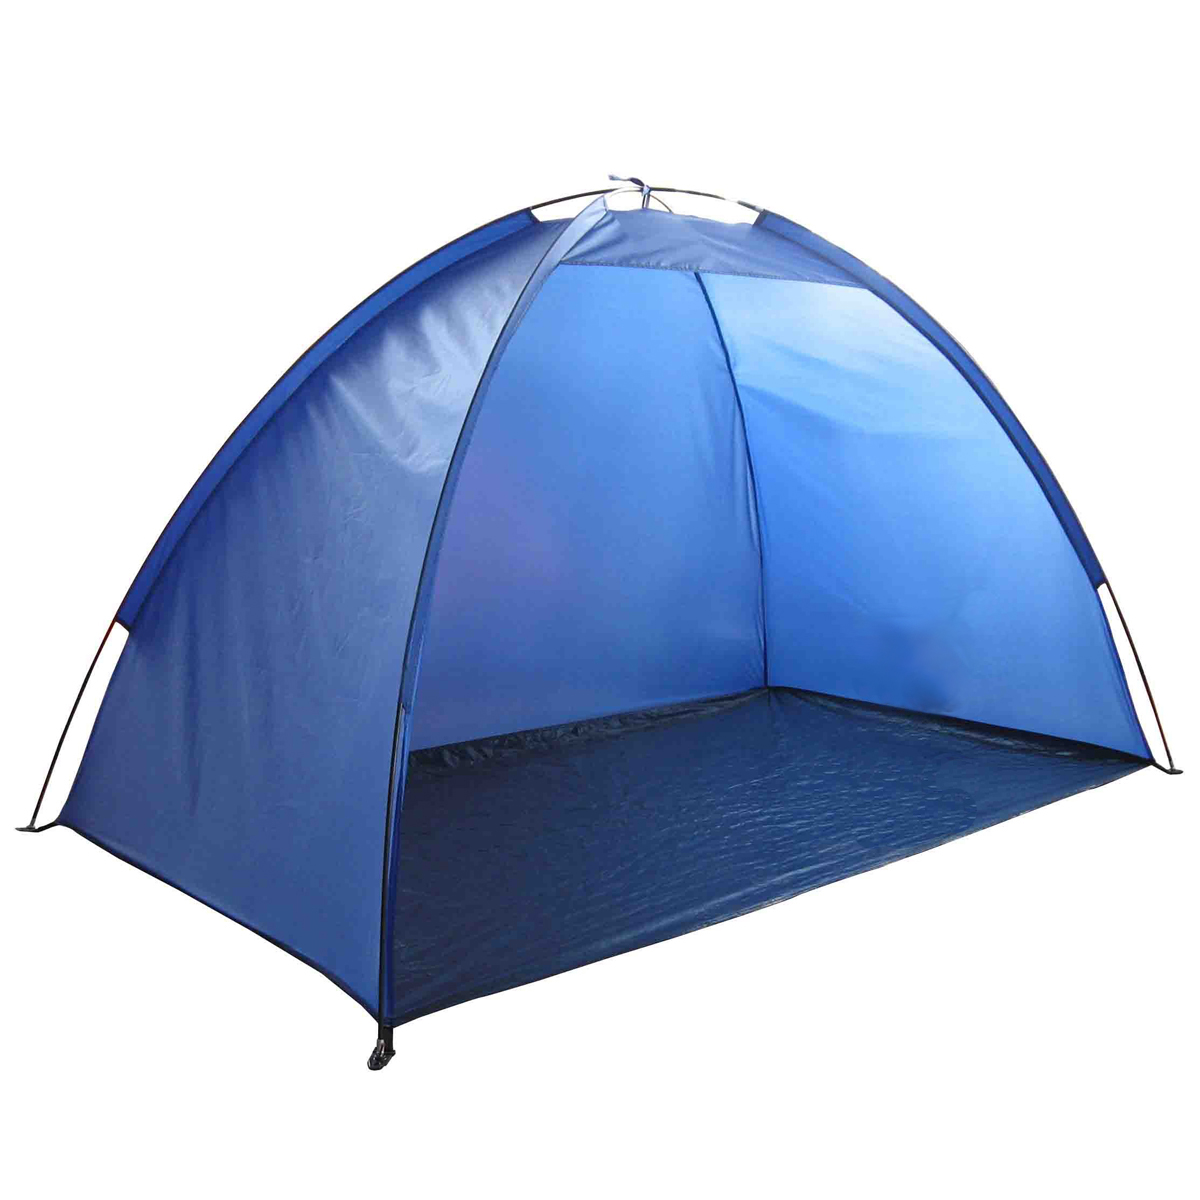 Cabana Portable Shelter : Blue portable sun shade shelter cabana beach protection